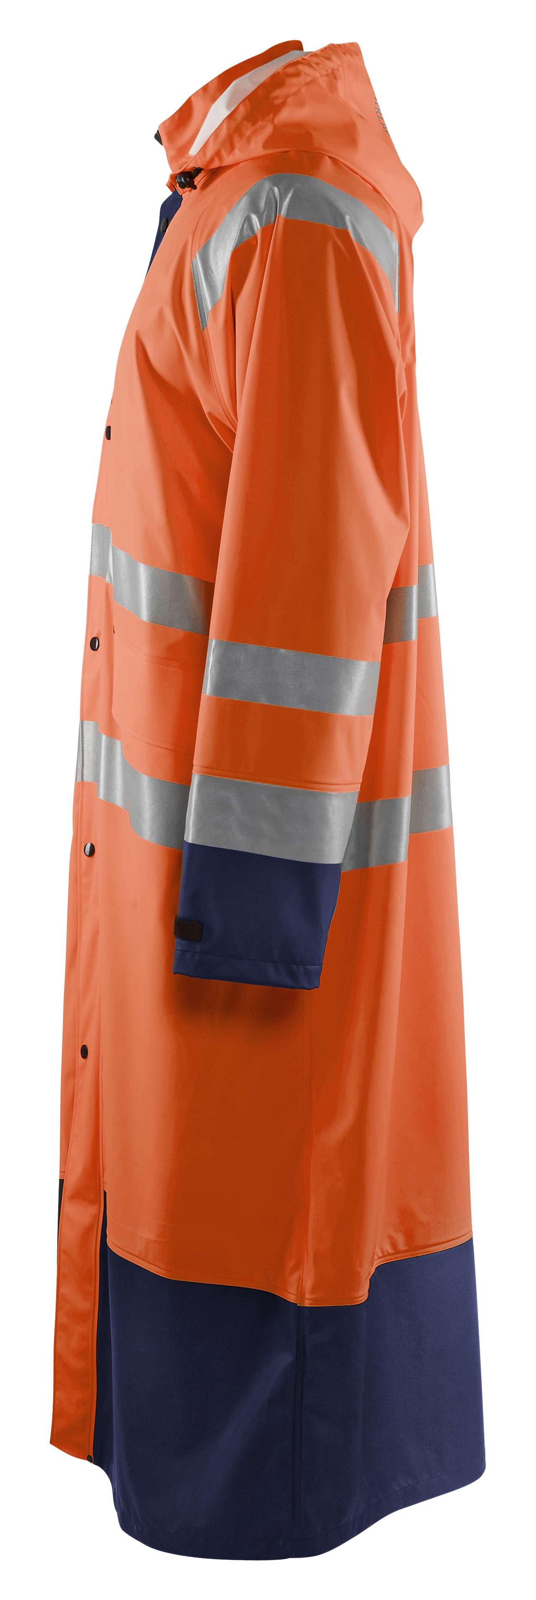 Blaklader Regenjassen 43252000 High Vis oranje-marineblauw(5389)